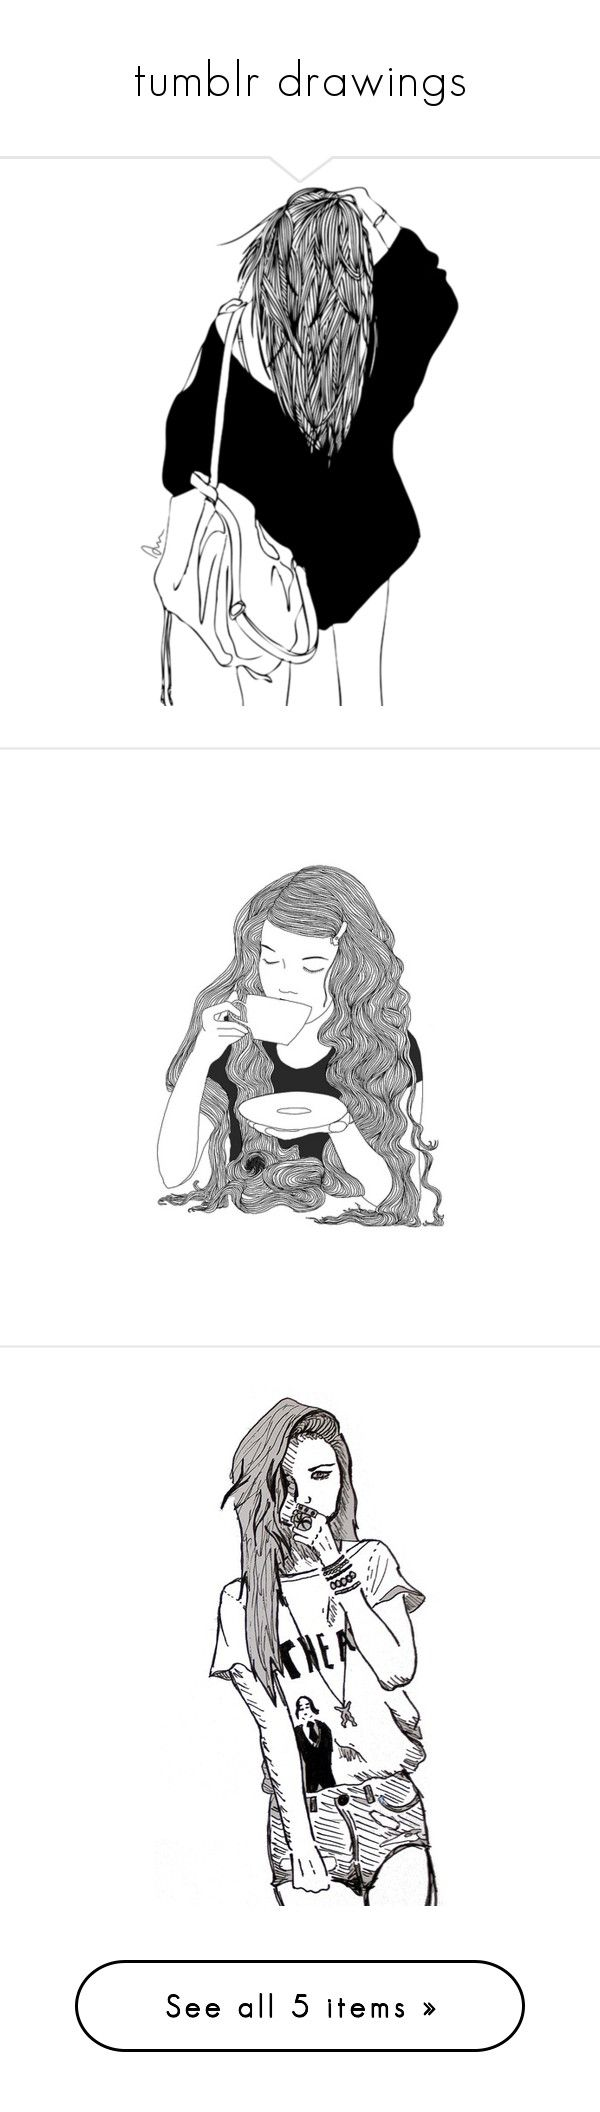 Drawn quote art tumblr Love drawings